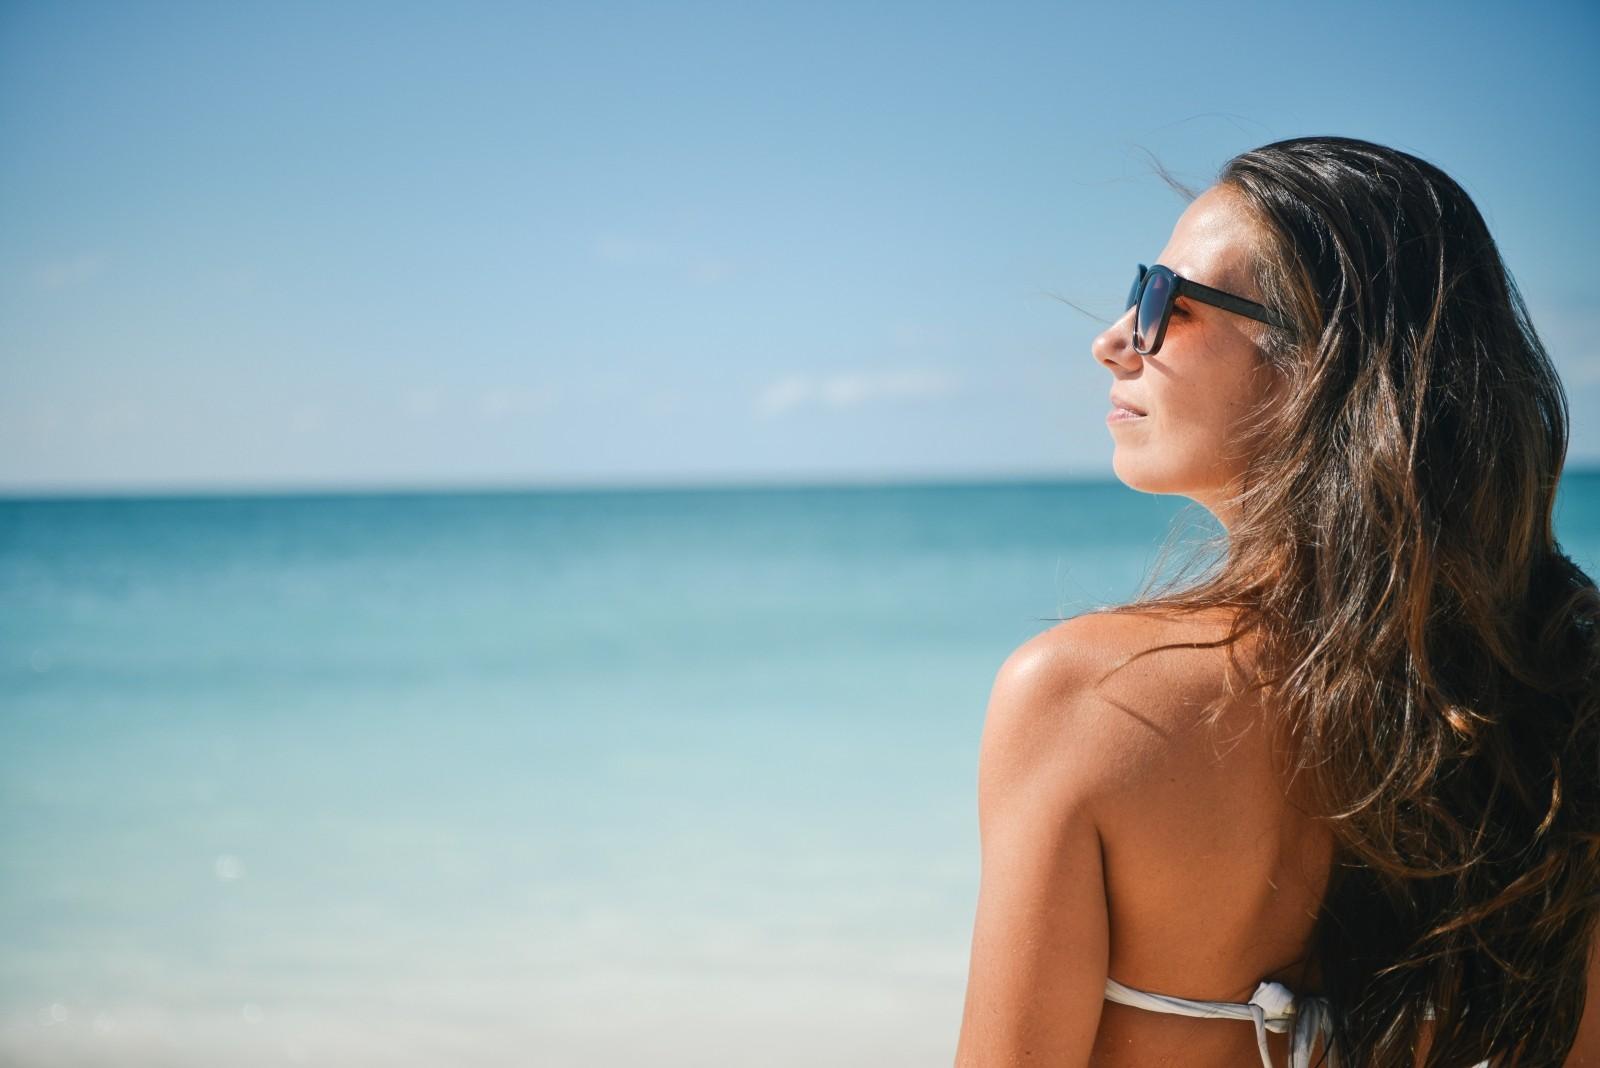 verano-tatuajes-laser-eliminar-calor-playa-sol